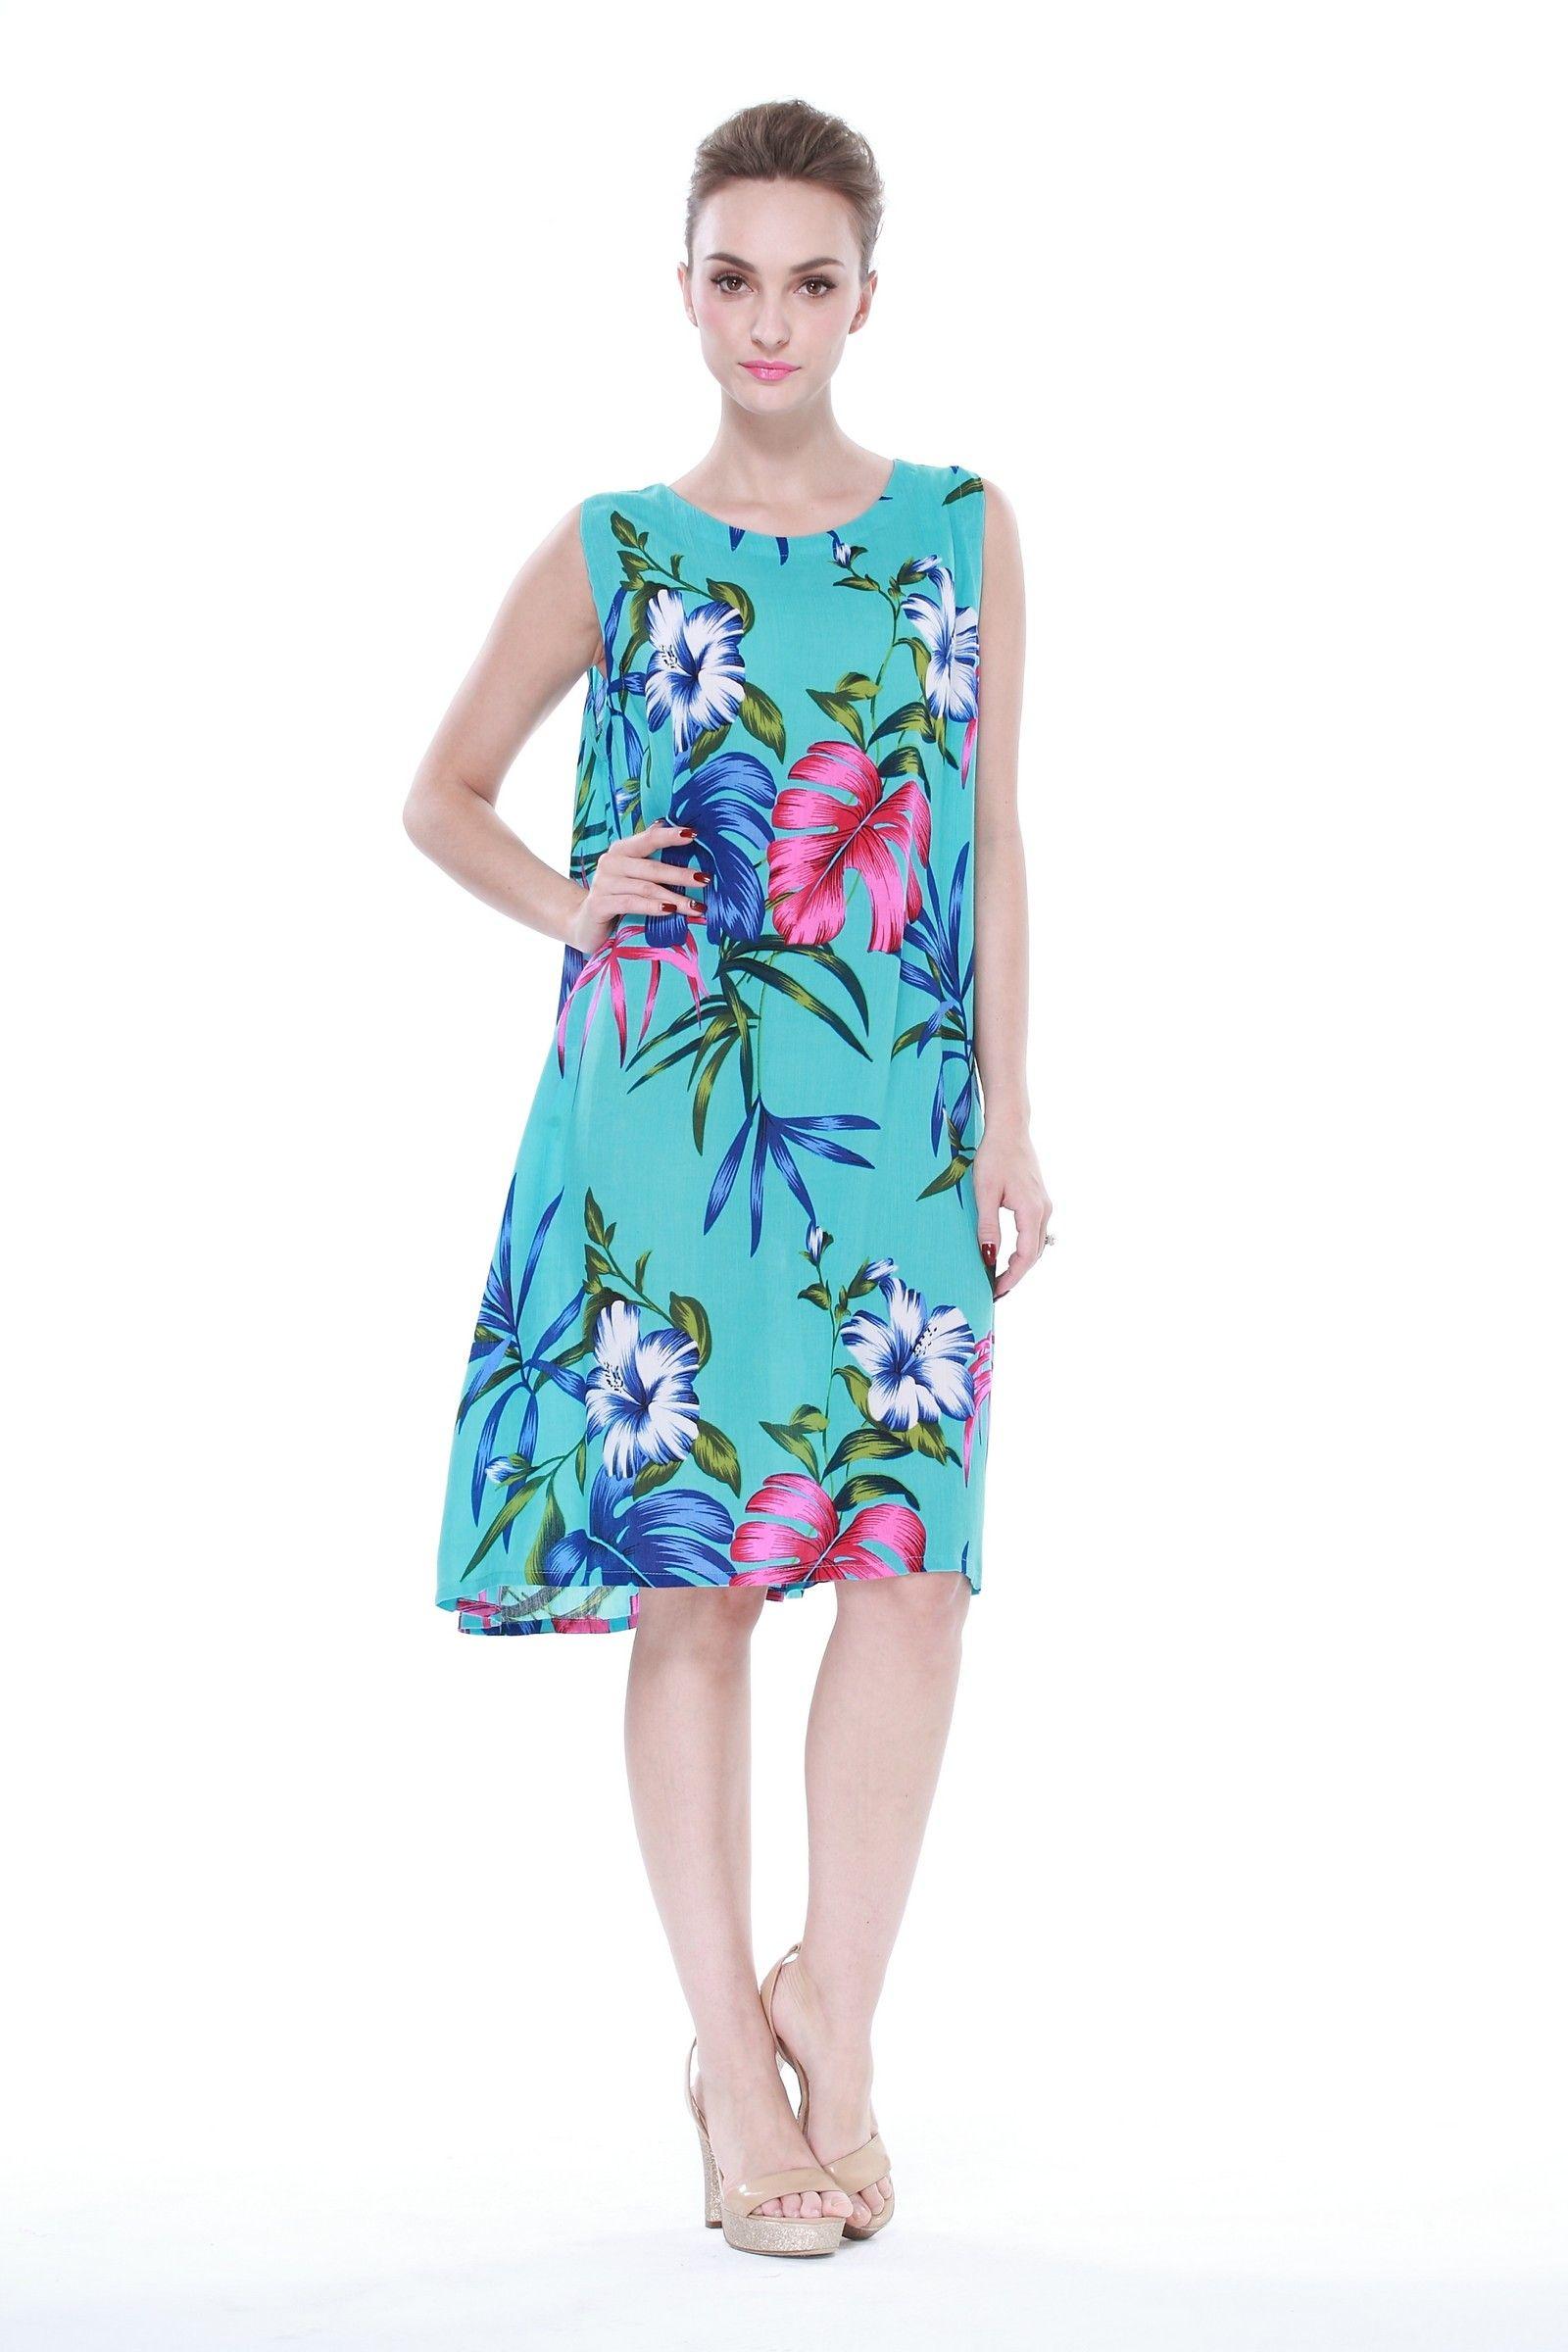 Crinkle A Line Flowy Luau Dress in Pretty Floral Turquoise | Luau ...